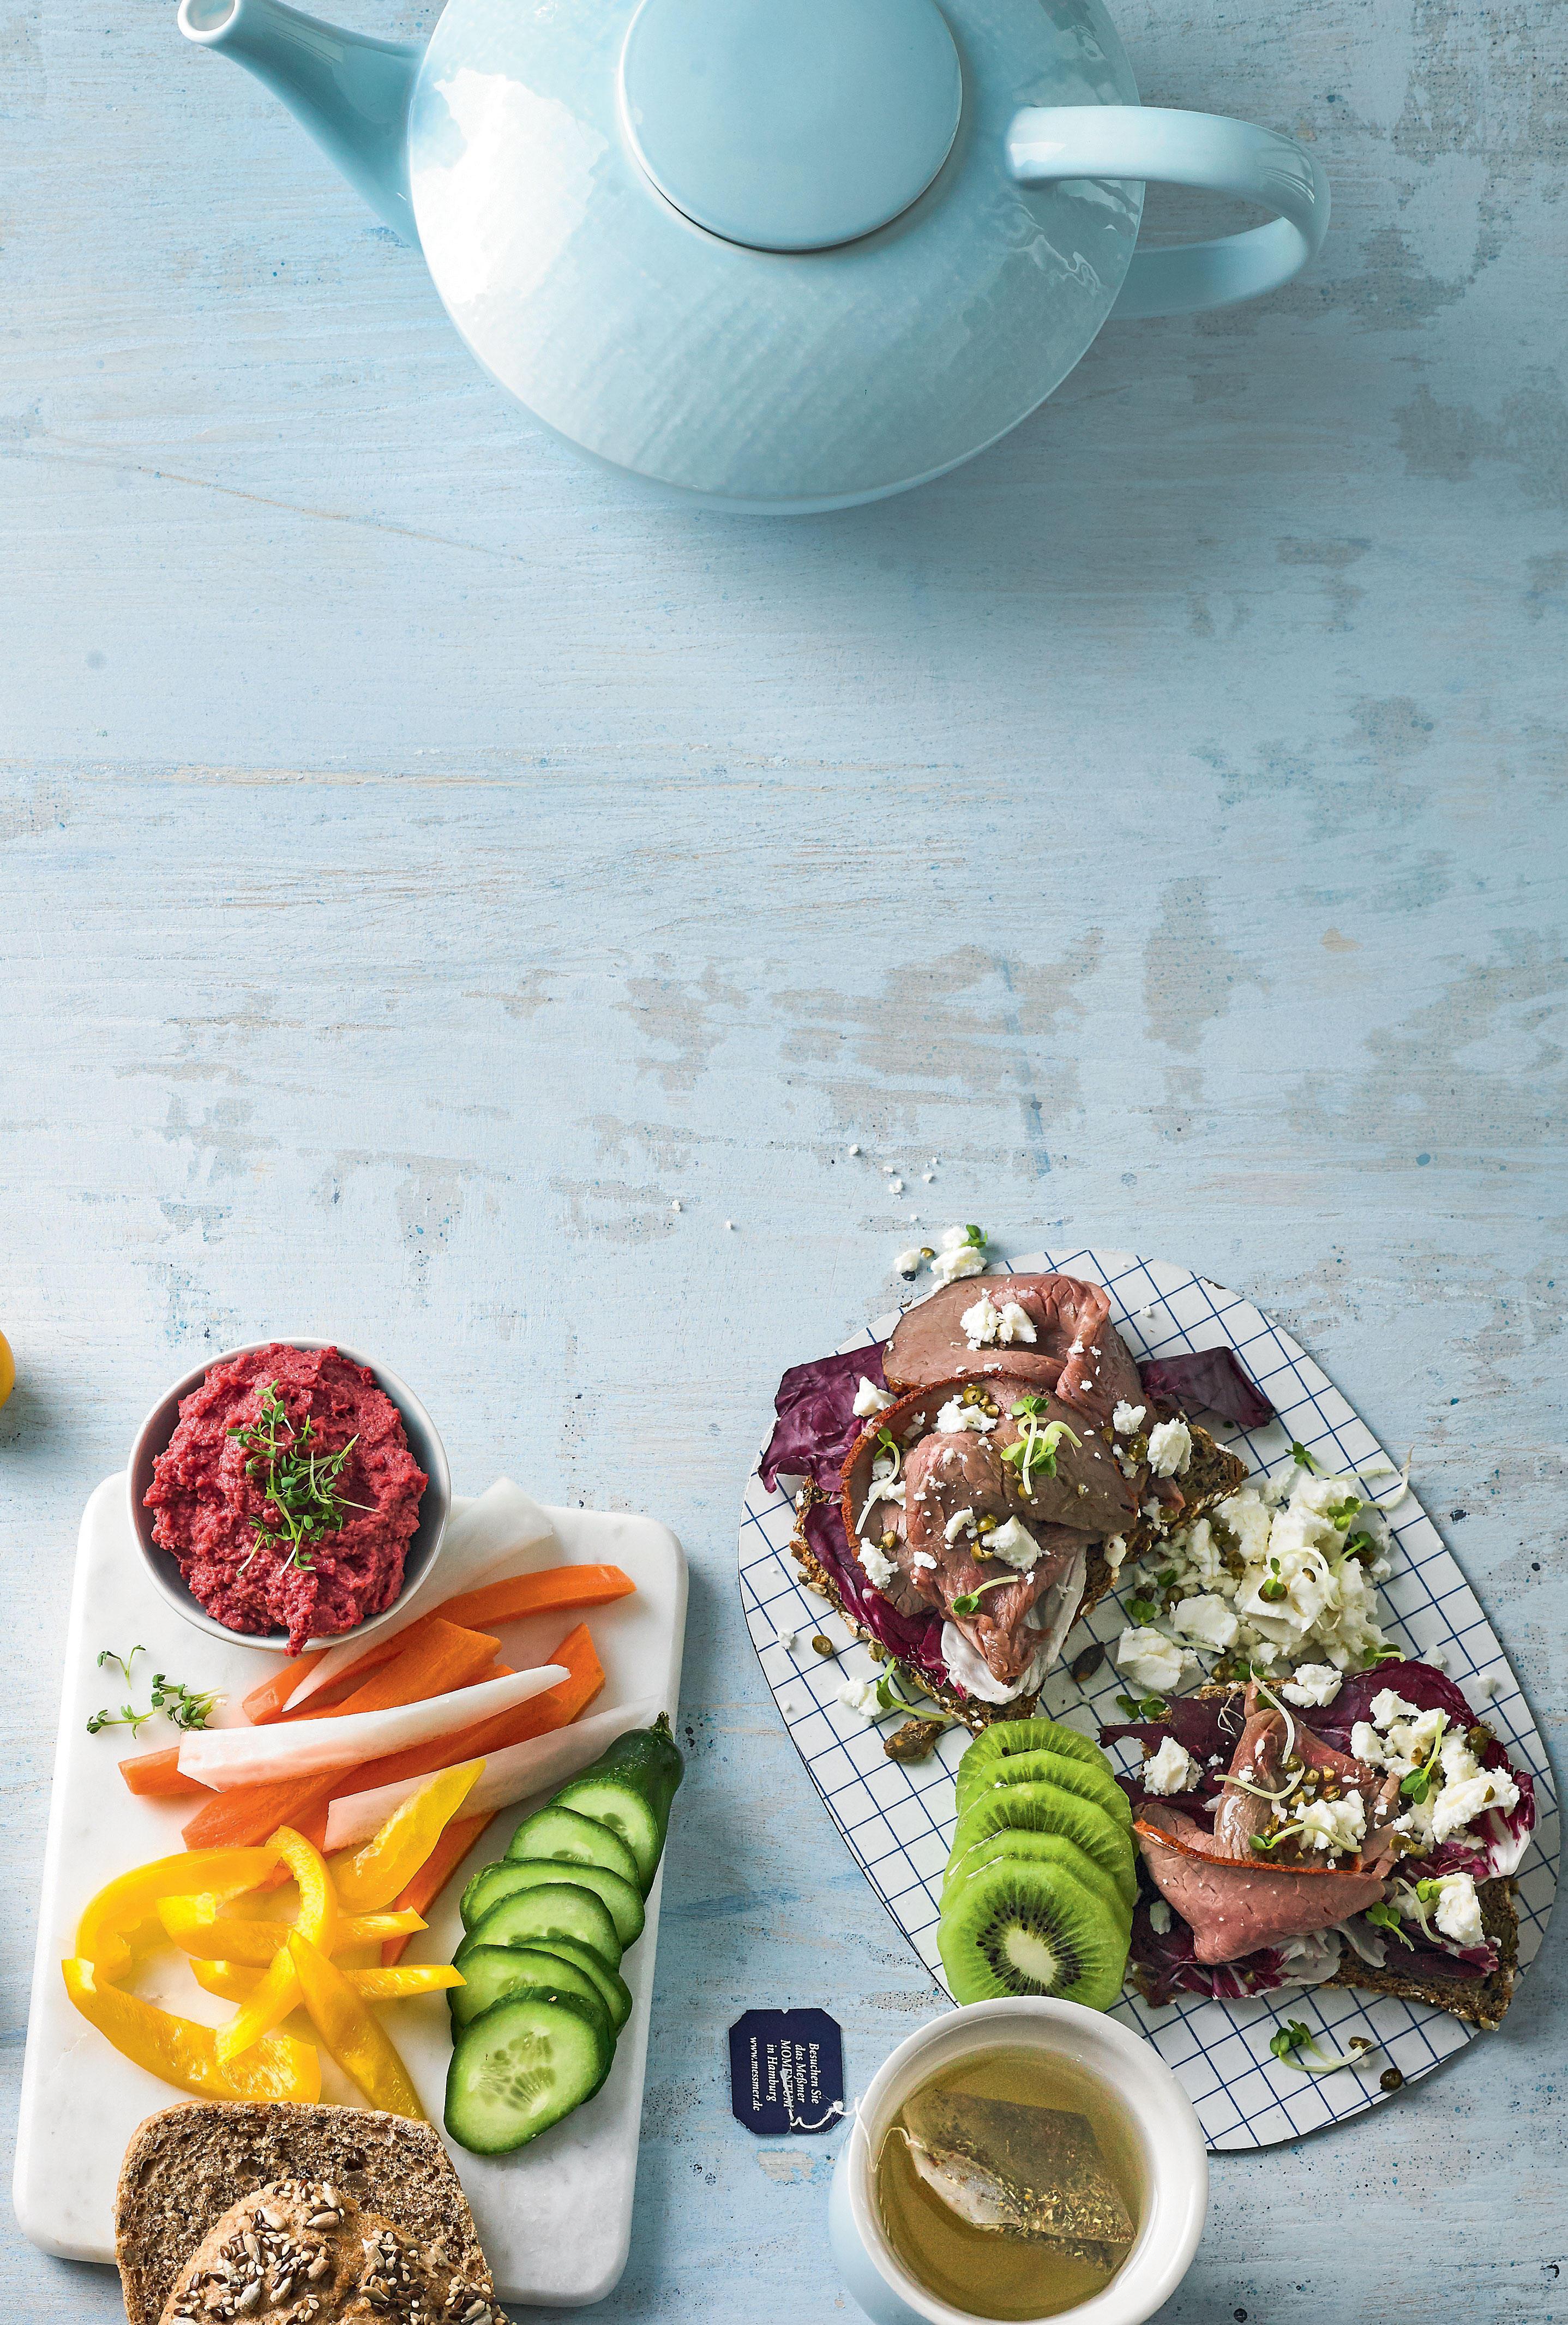 Gemüse-Dipper mit scharfem Hummus